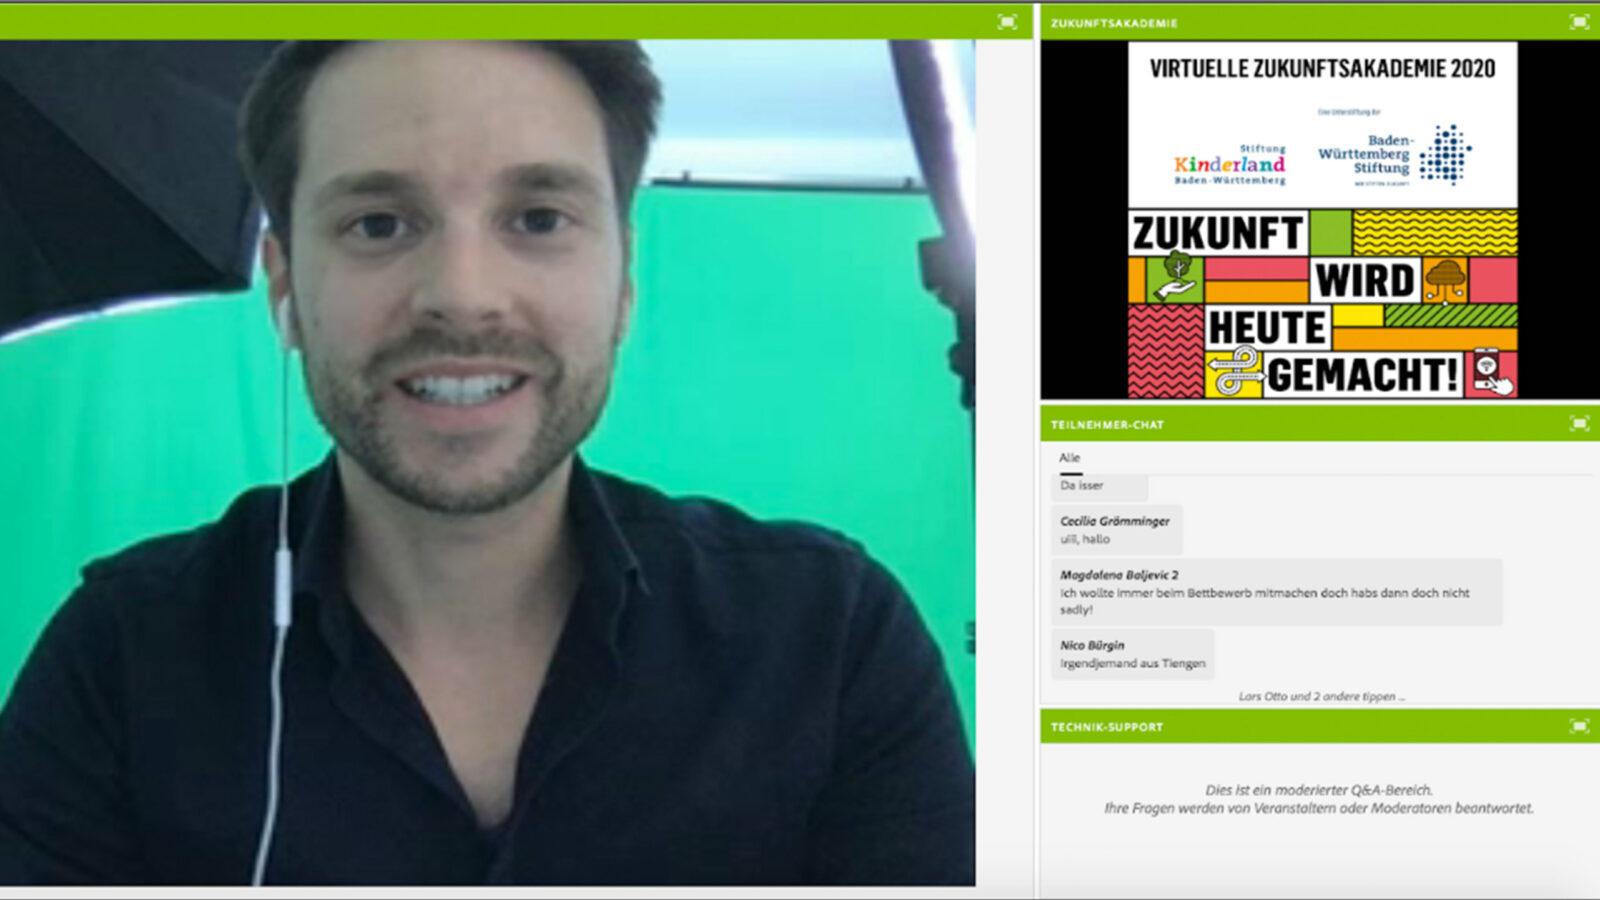 Virtuelle Zukunftsakademie Screenshot